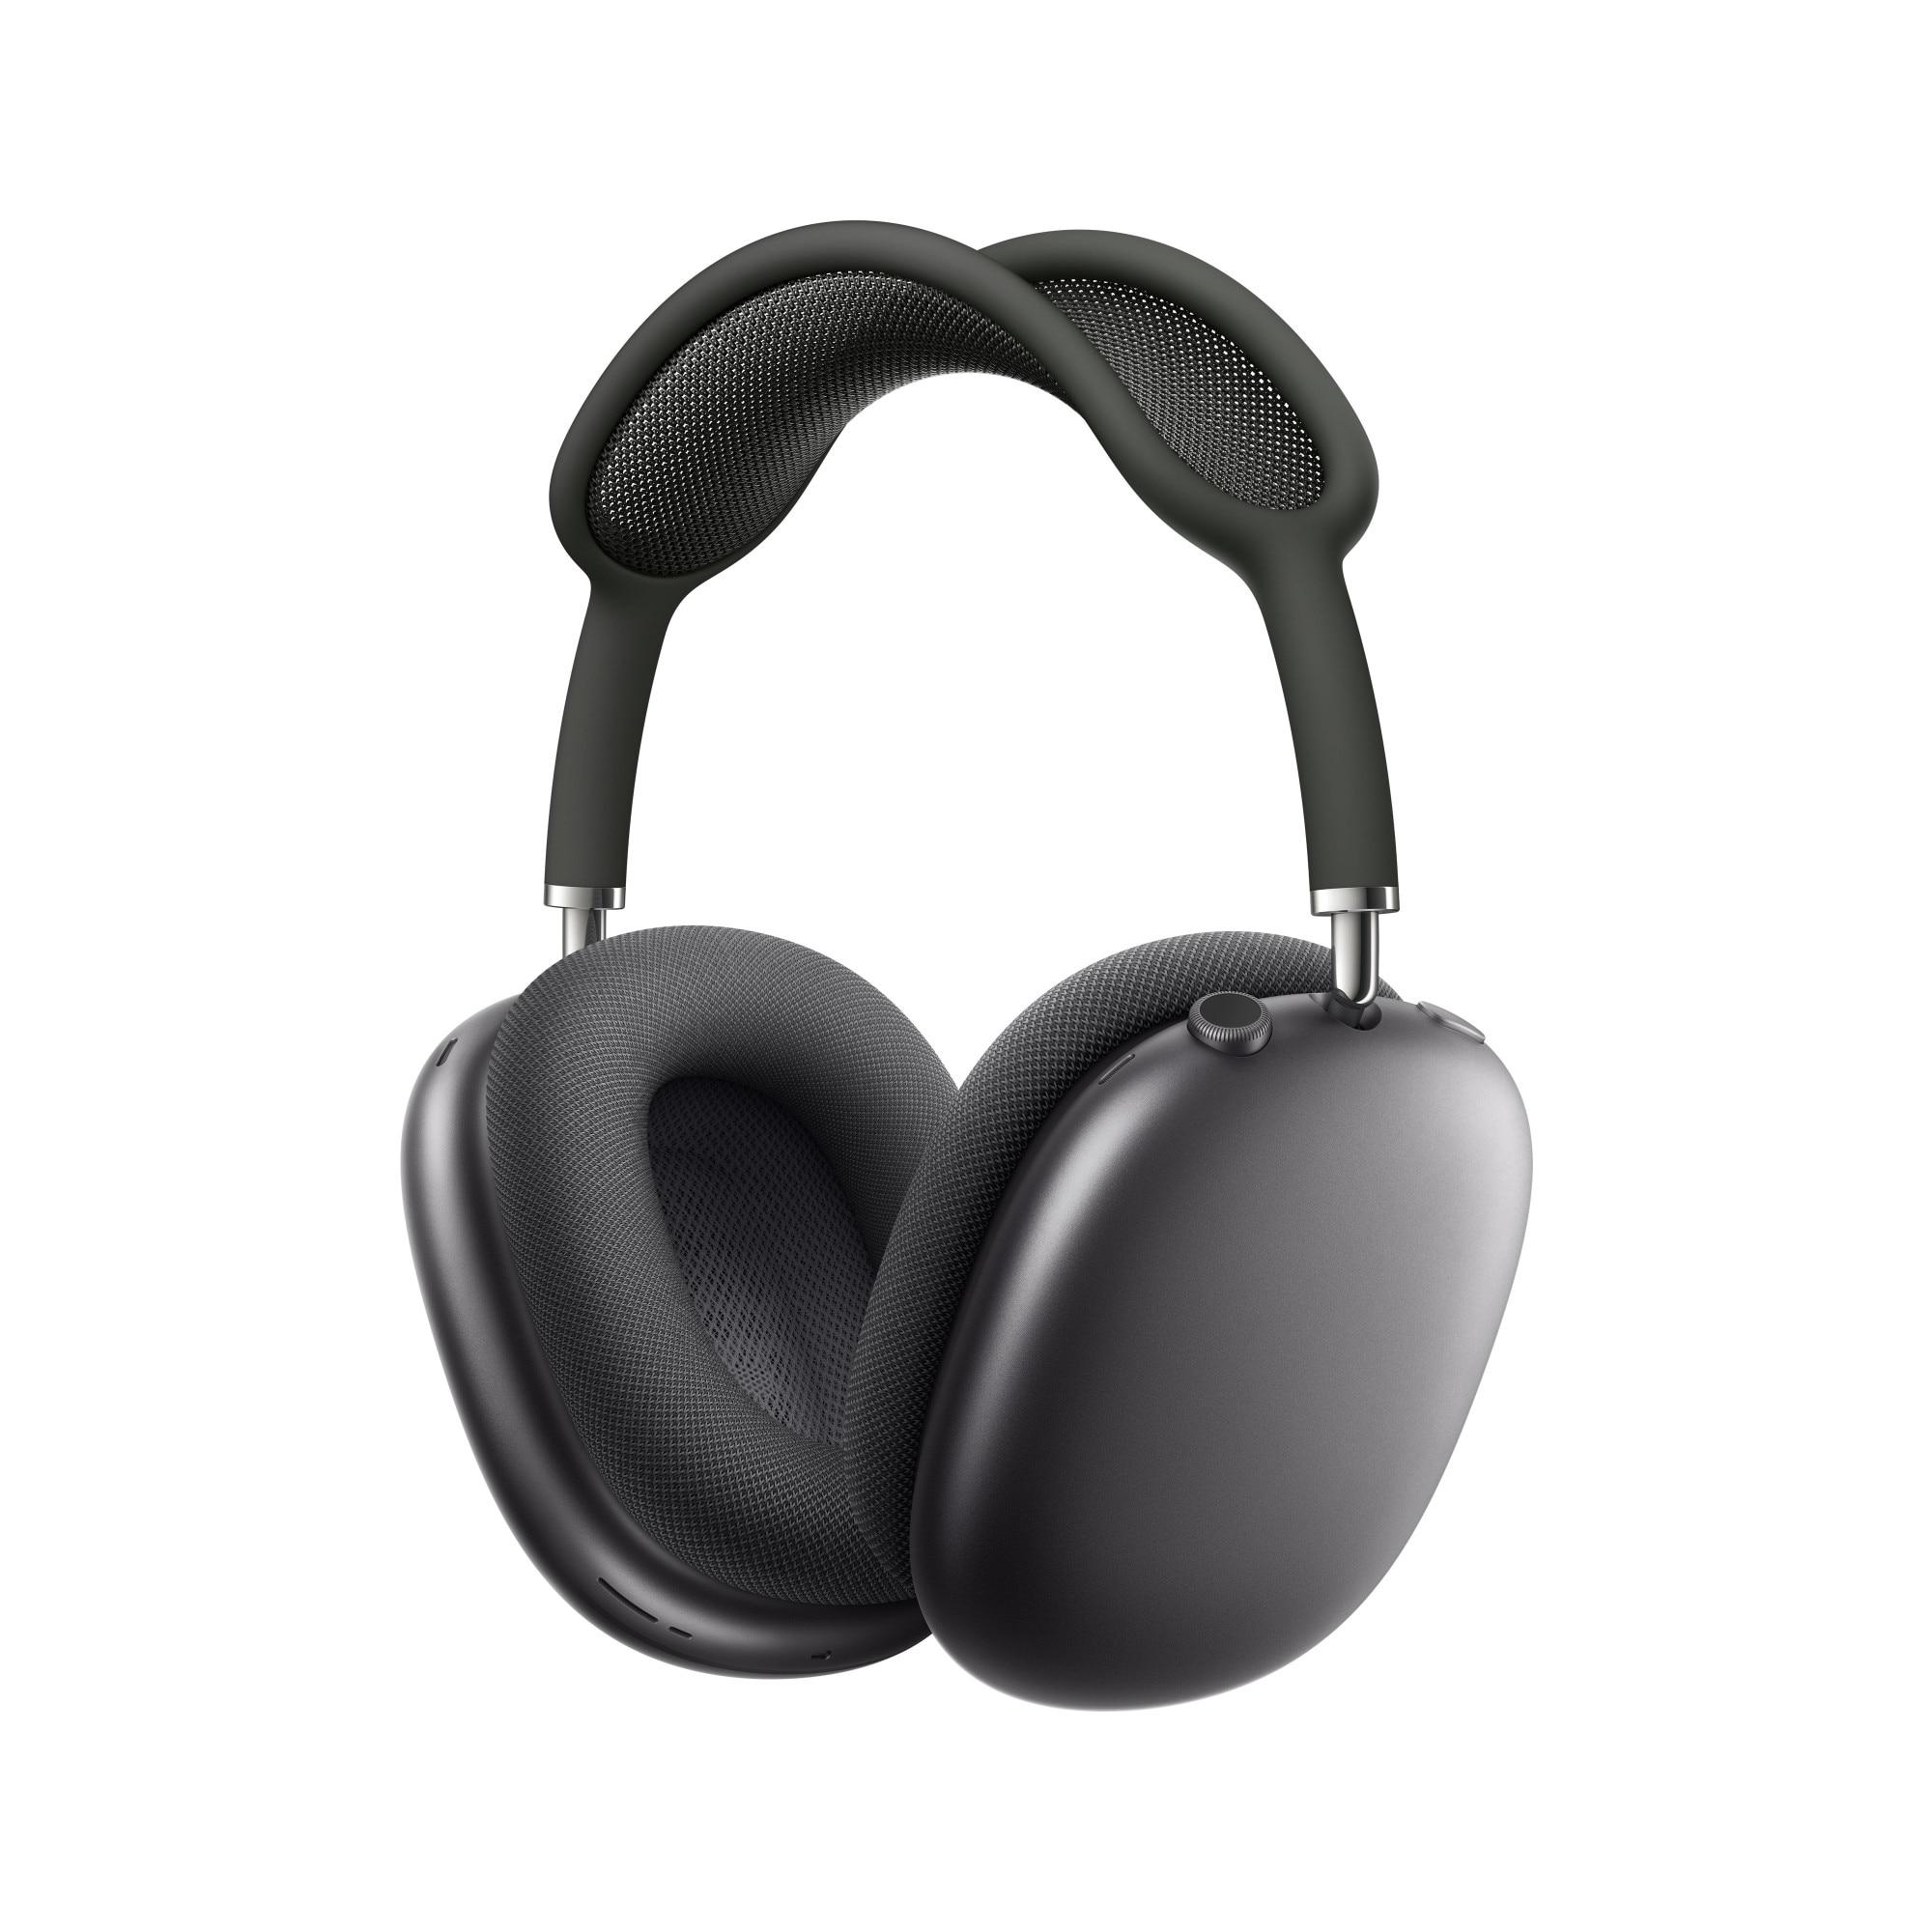 Fotografie Casti Audio Over the Ear Apple AirPods Max, Wireless, Bluetooth, Noise cancelling, Microfon, Autonomie 20 ore, Space Gray